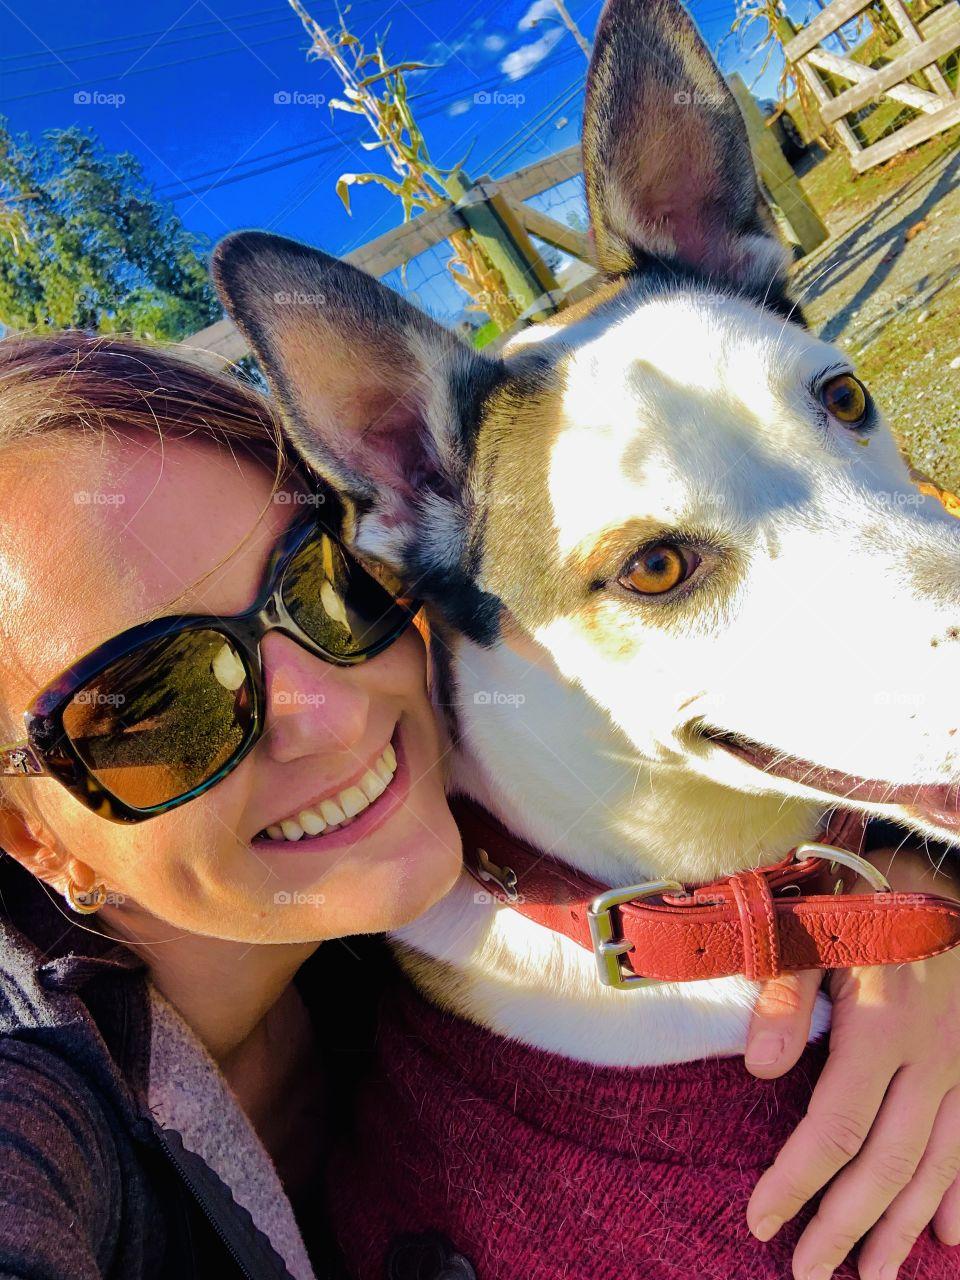 Selfie time with Effie